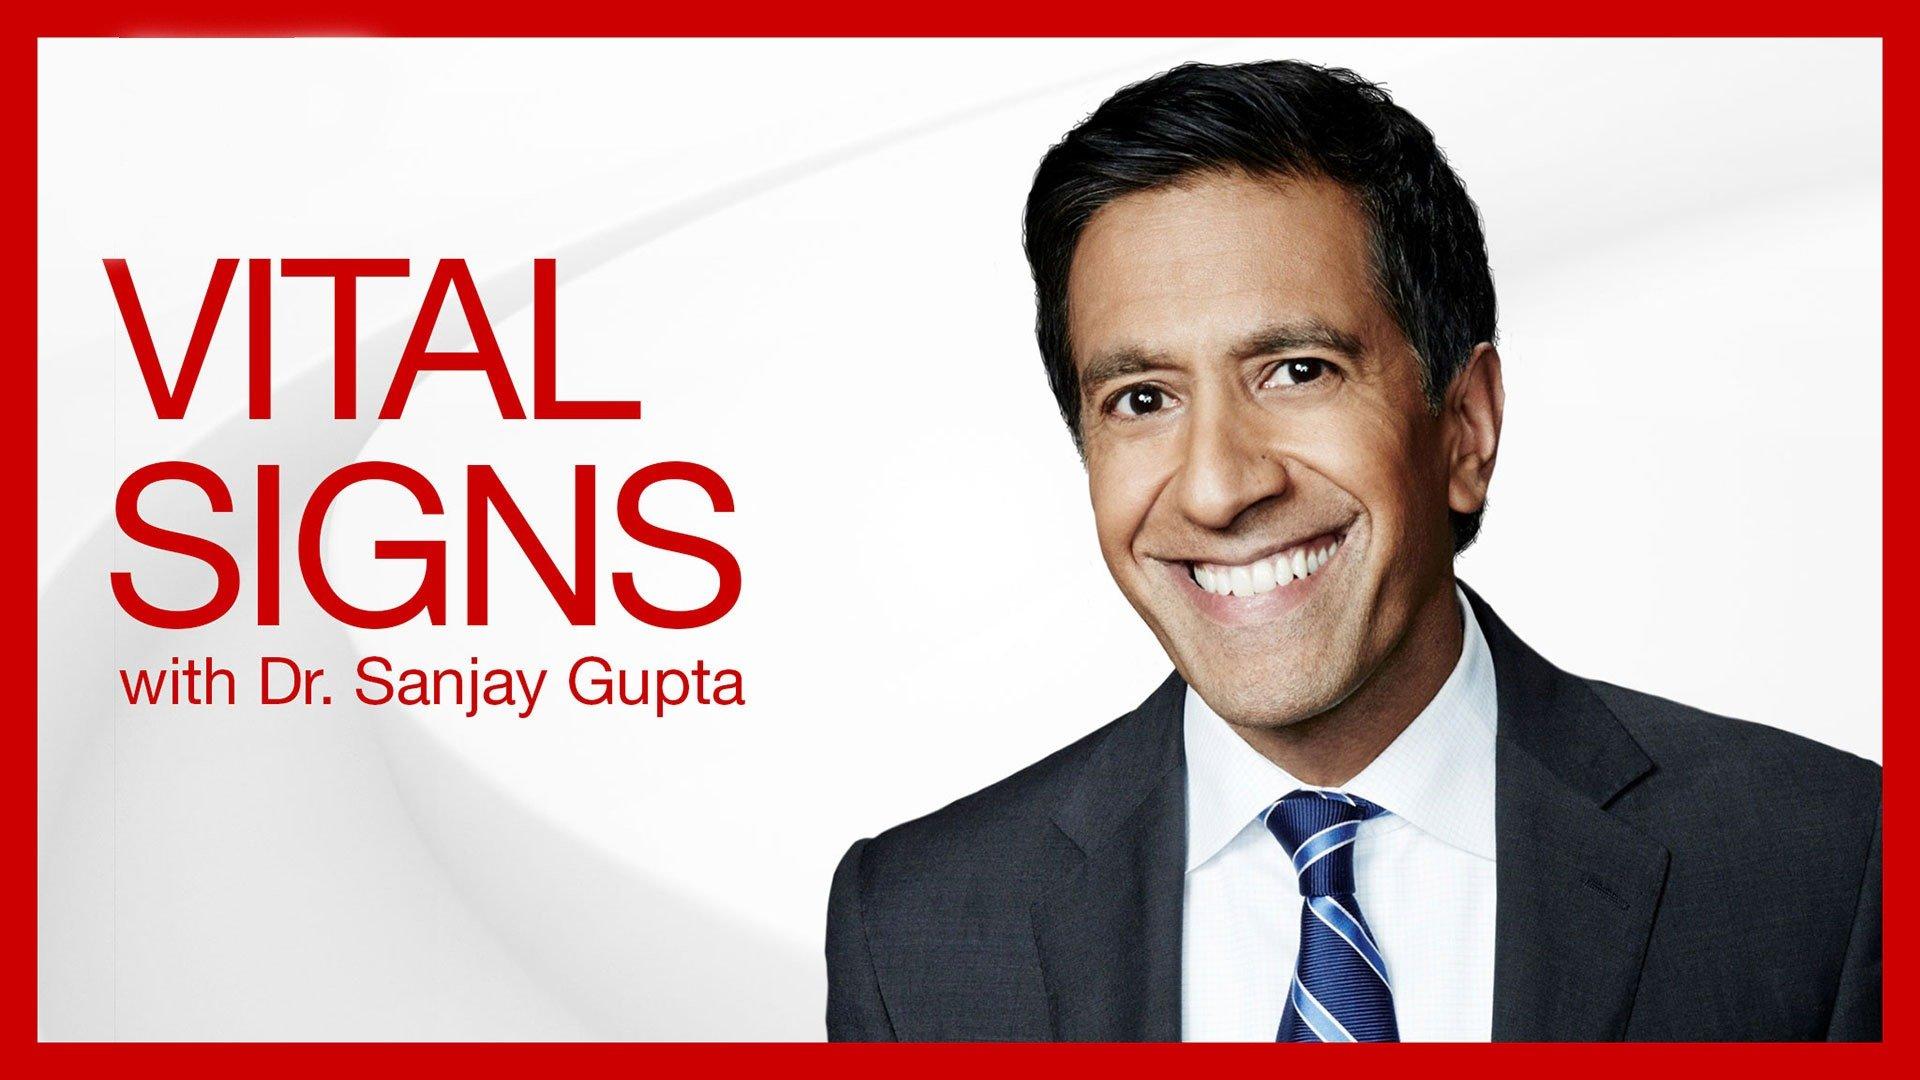 Vital Signs With Dr. Sanjay Gupta